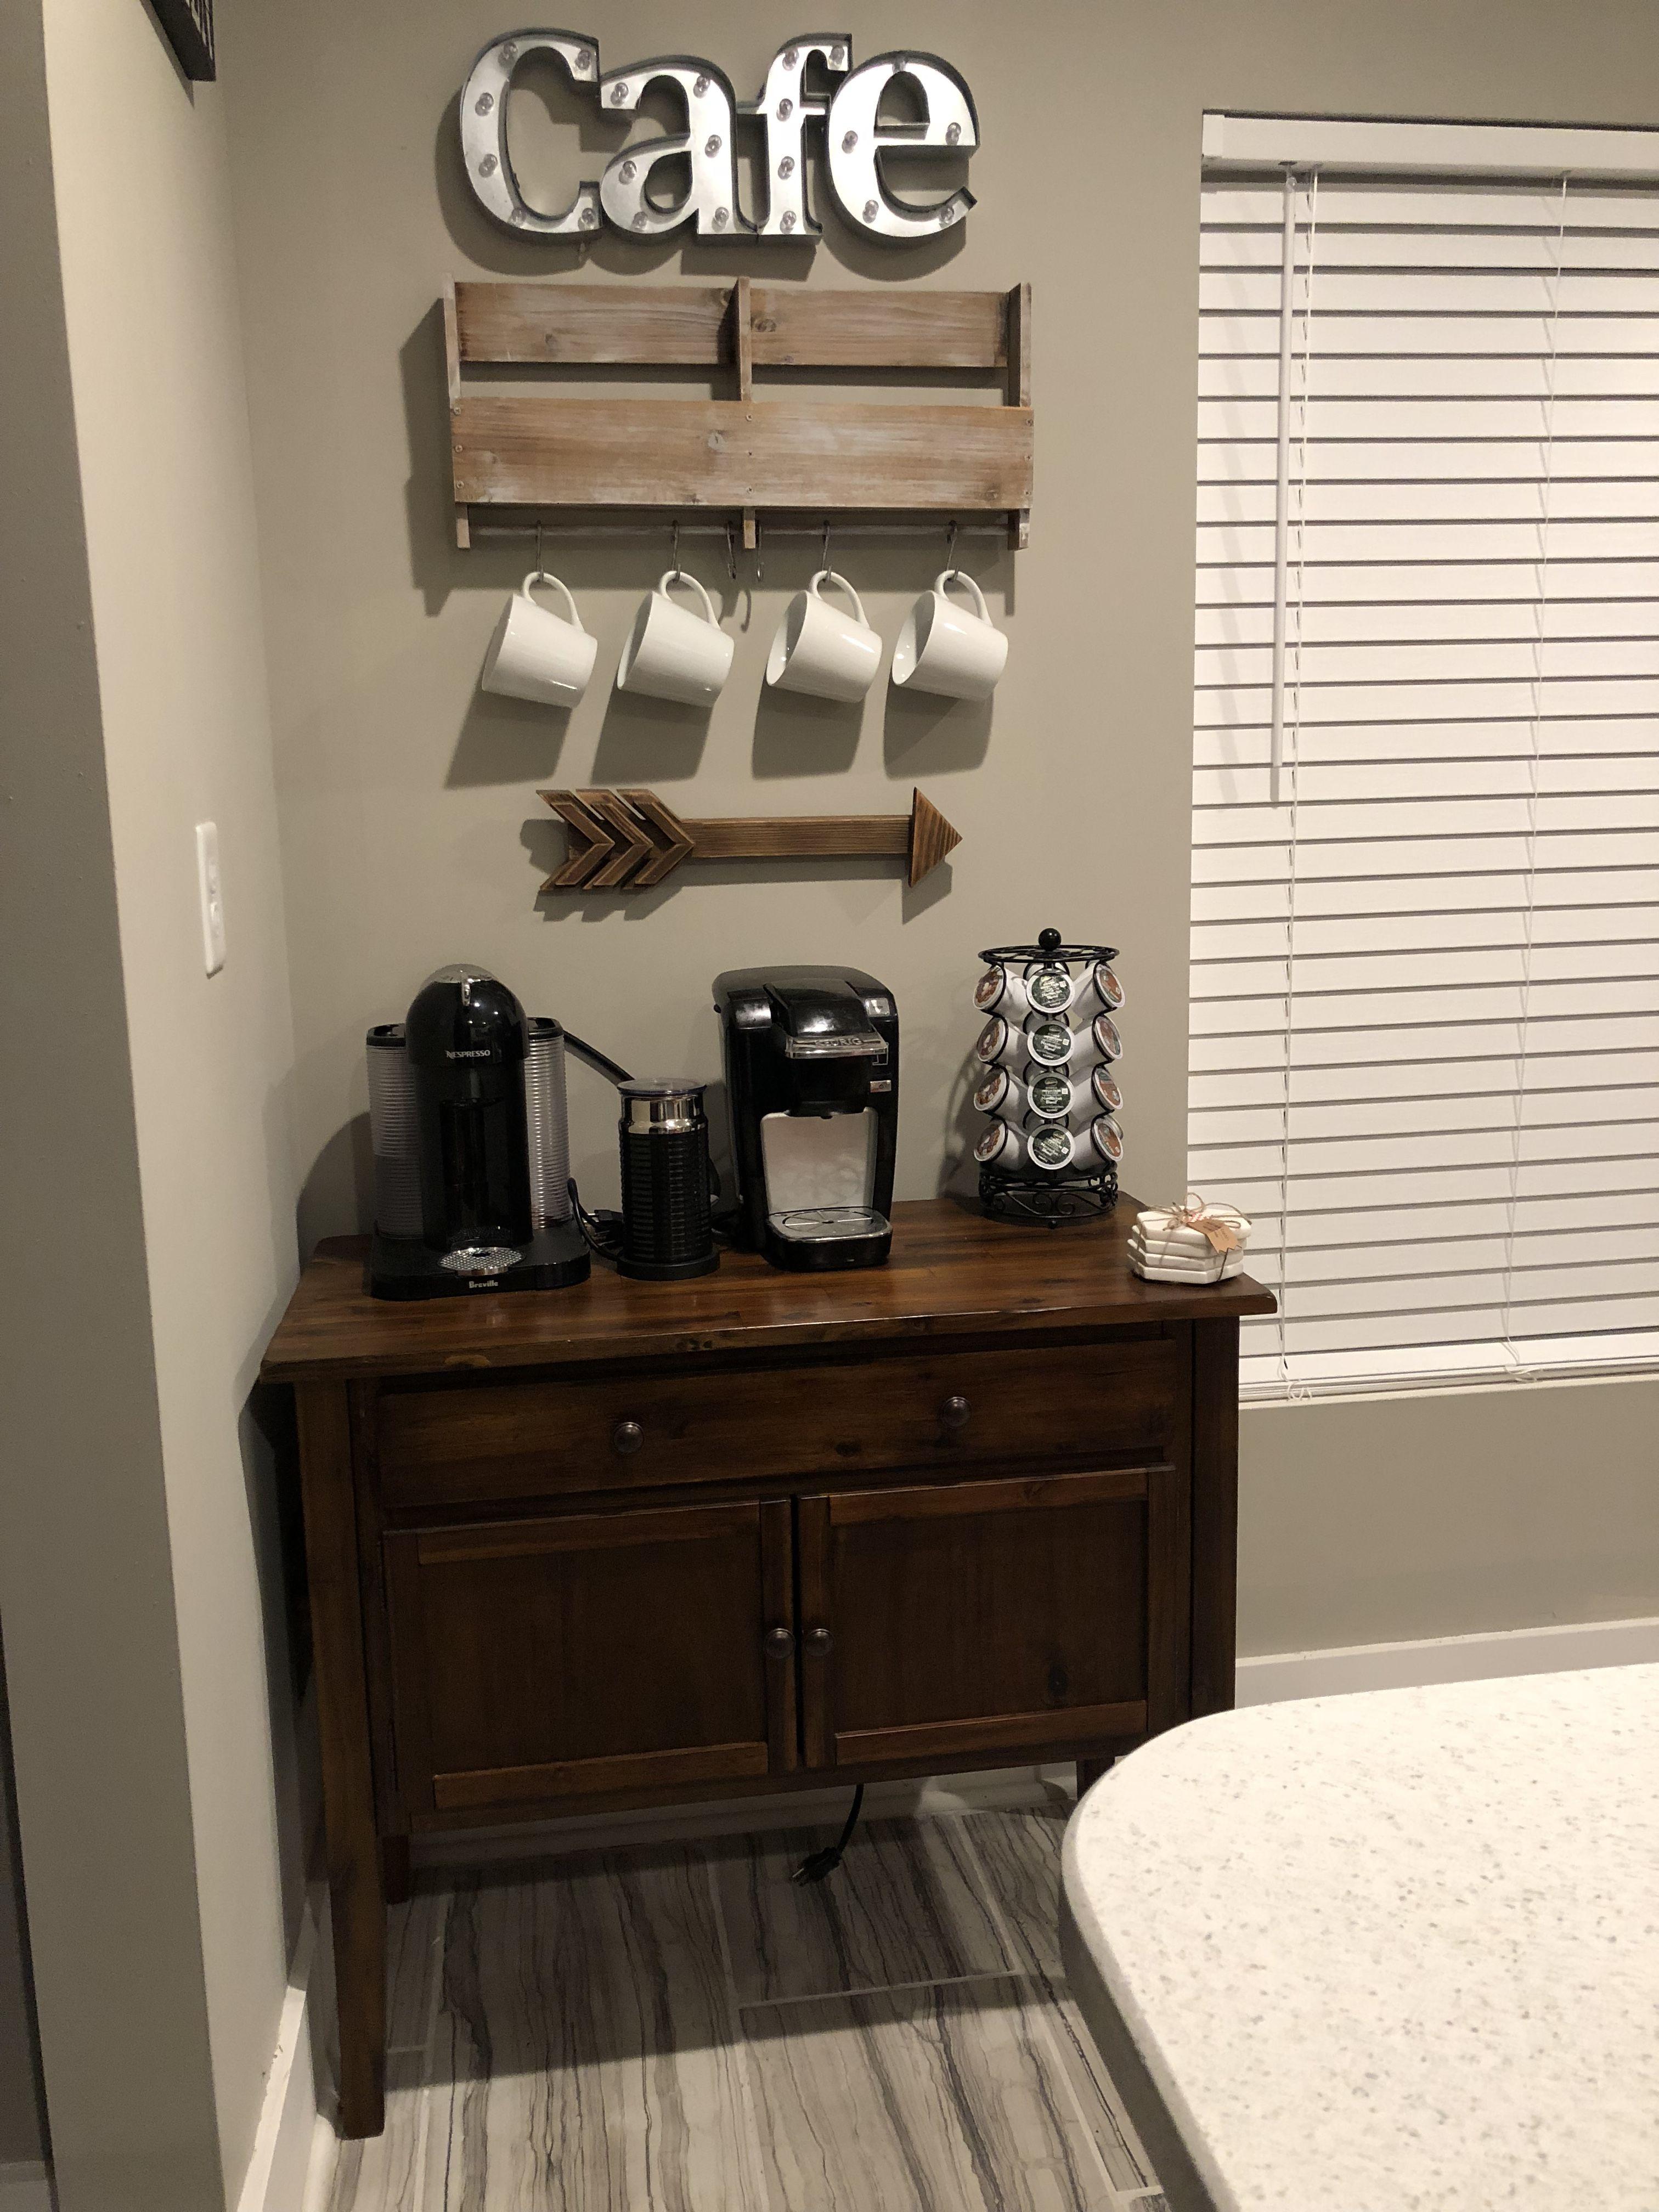 Coffee Station / Coffee Bar / Cafe Keurig and Nespresso